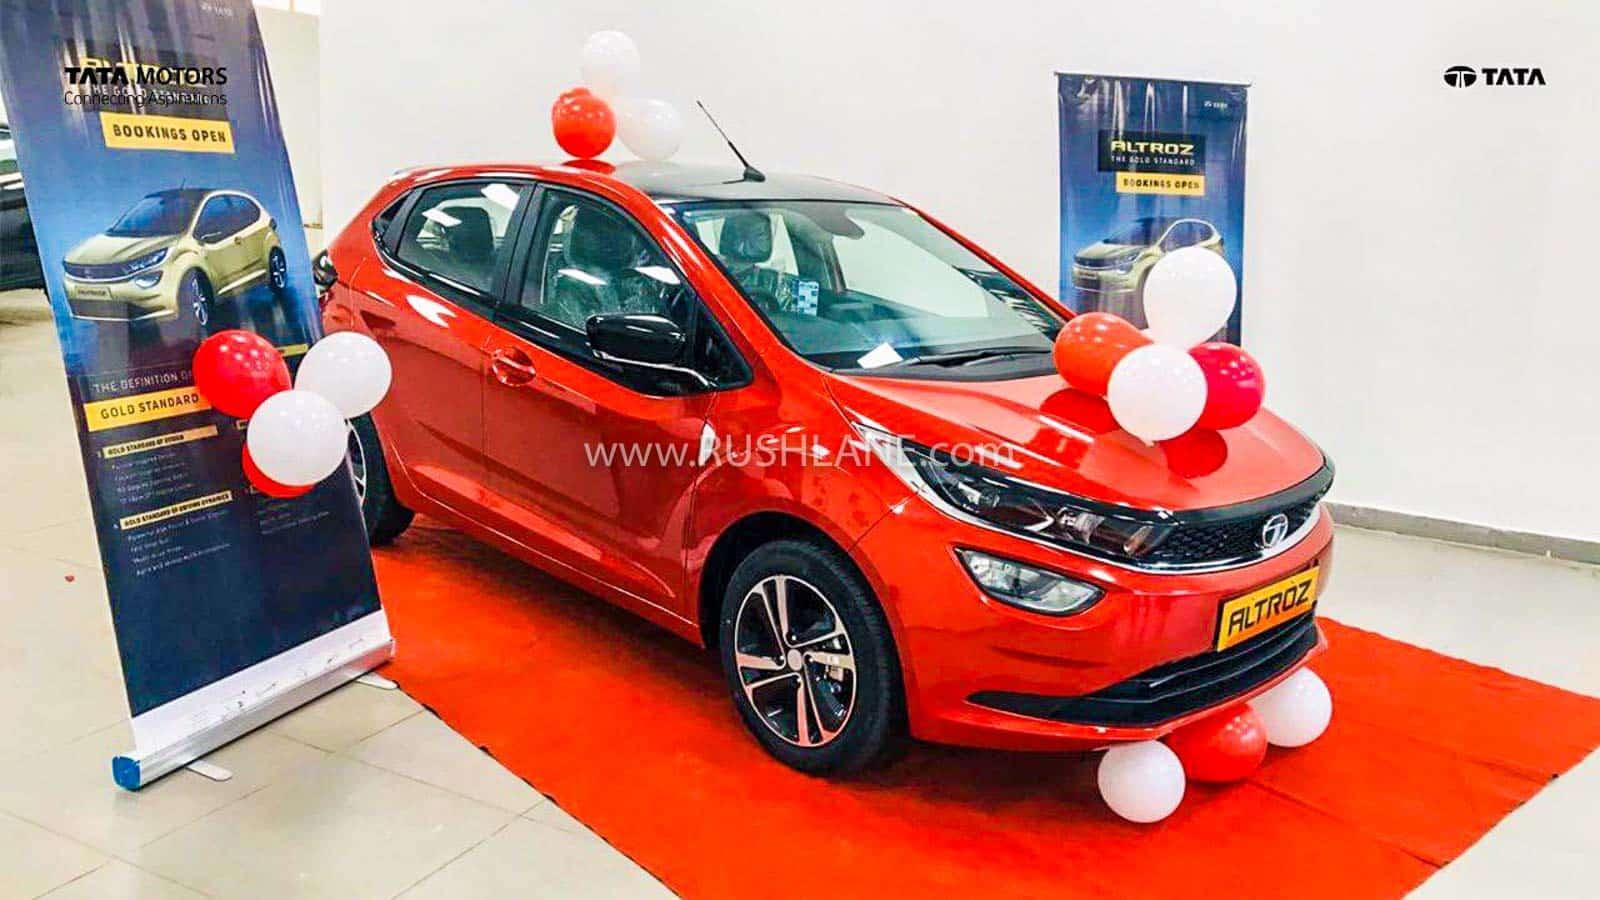 Tata Altroz delivery starts